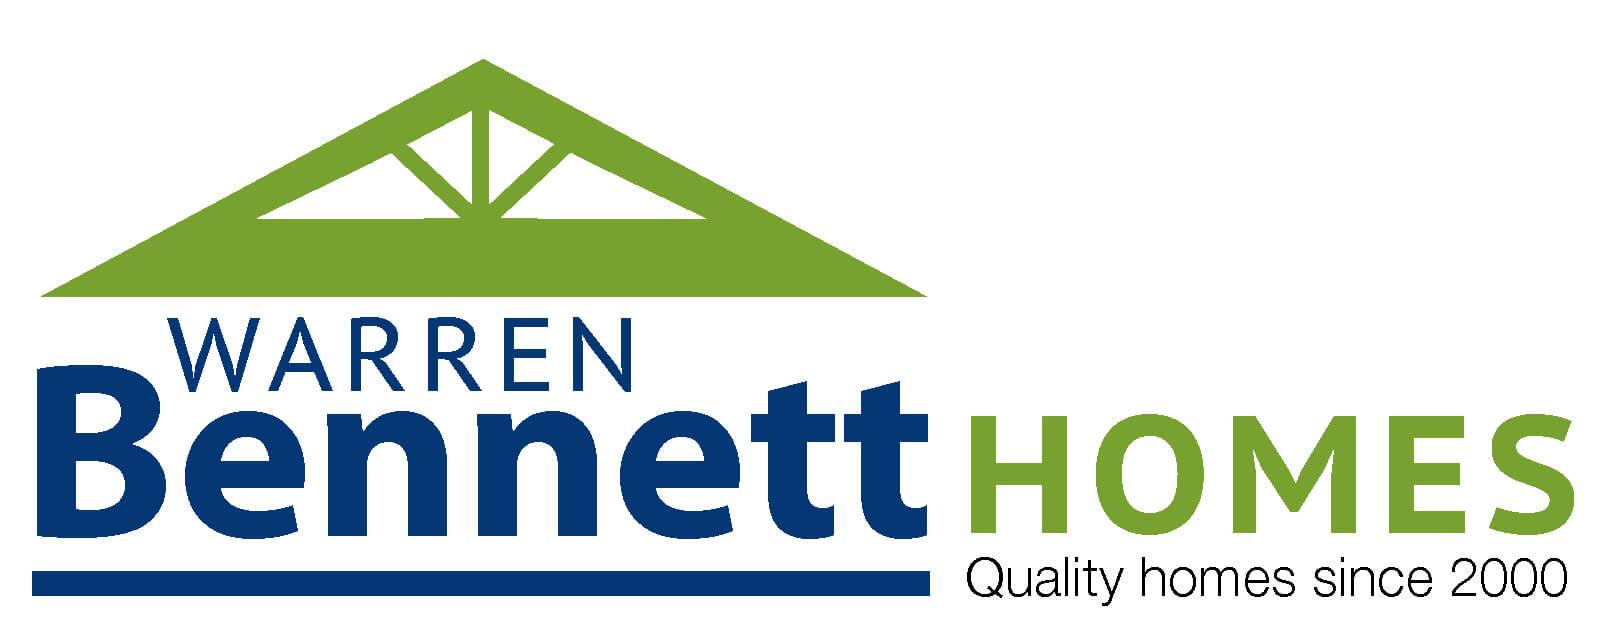 Warren Bennett landscape logo